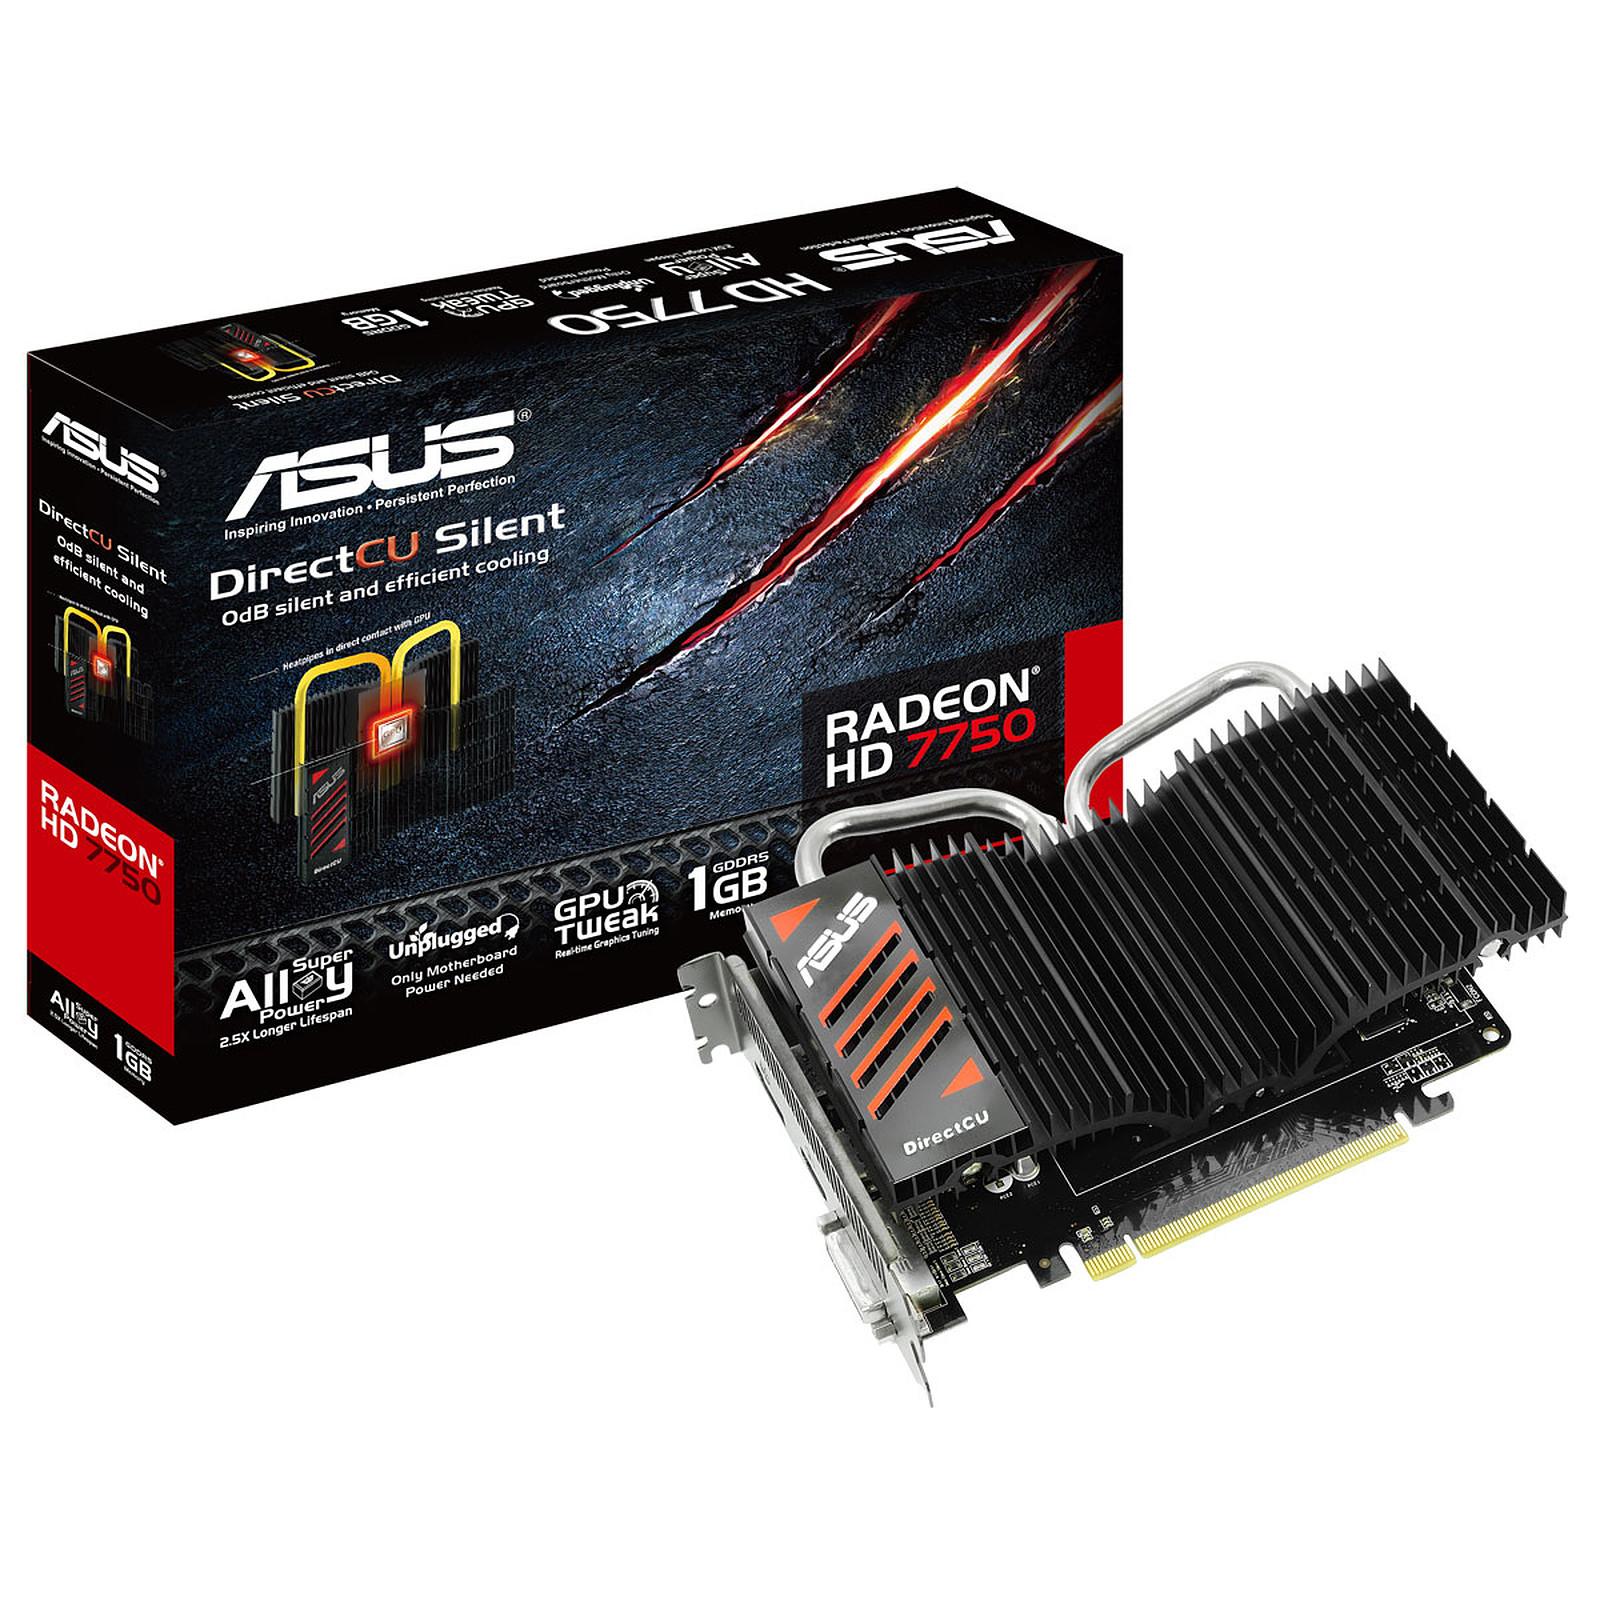 ASUS HD7750-DCSL-1GD5 1GB